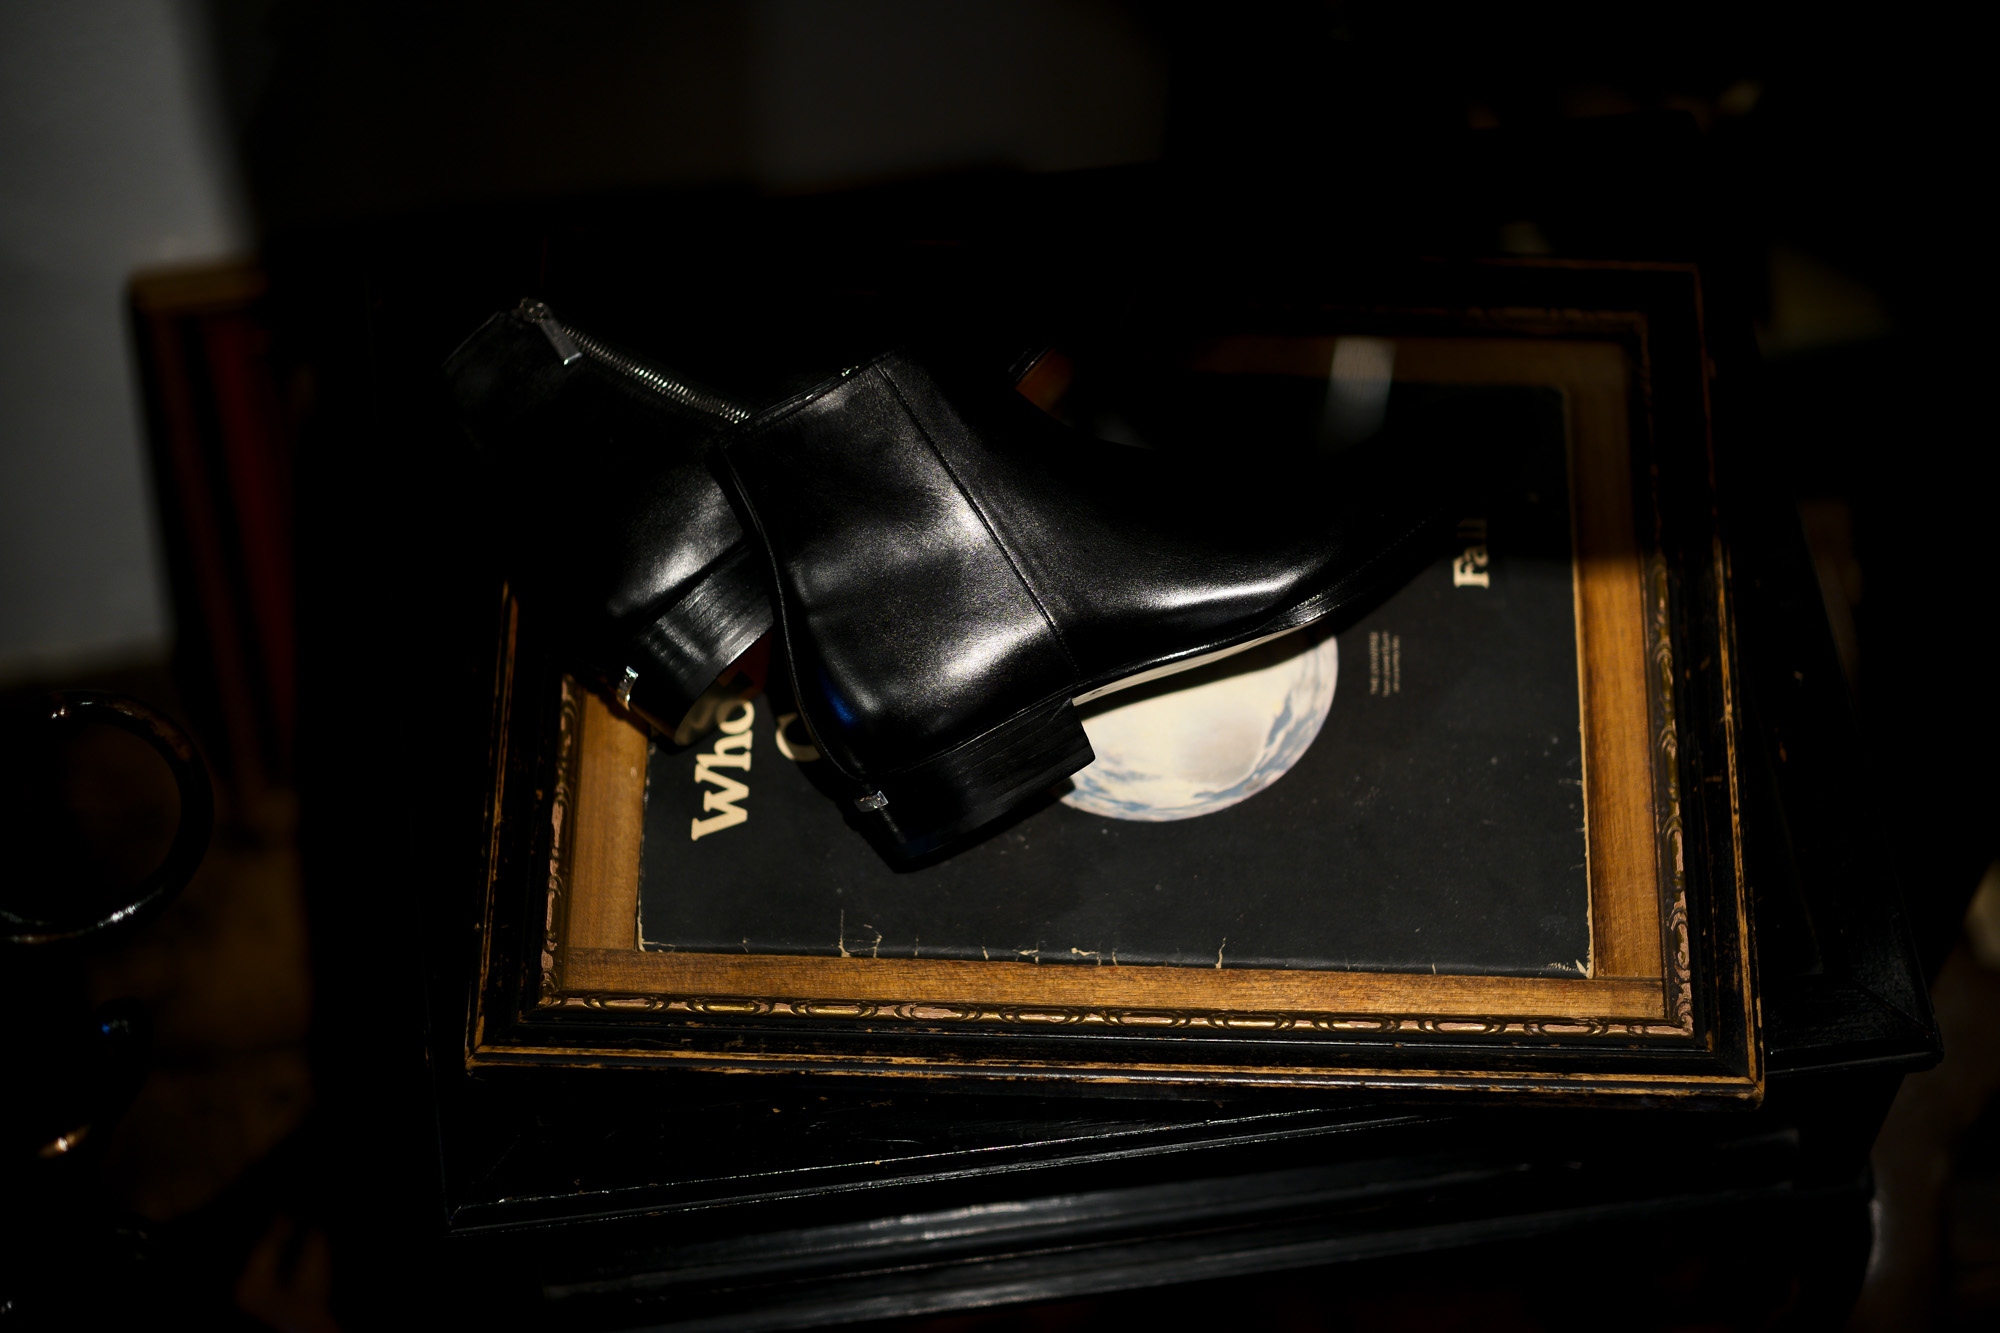 Georges de Patricia Stradale【Special Boots】 SF90 ストラダーレ フェラーリ PHEV ジョルジュドパトリシア ジップアップブーツ 925スターリングシルバー ブーツ 愛知 名古屋 Alto e Diritto altoediritto アルトエデリット